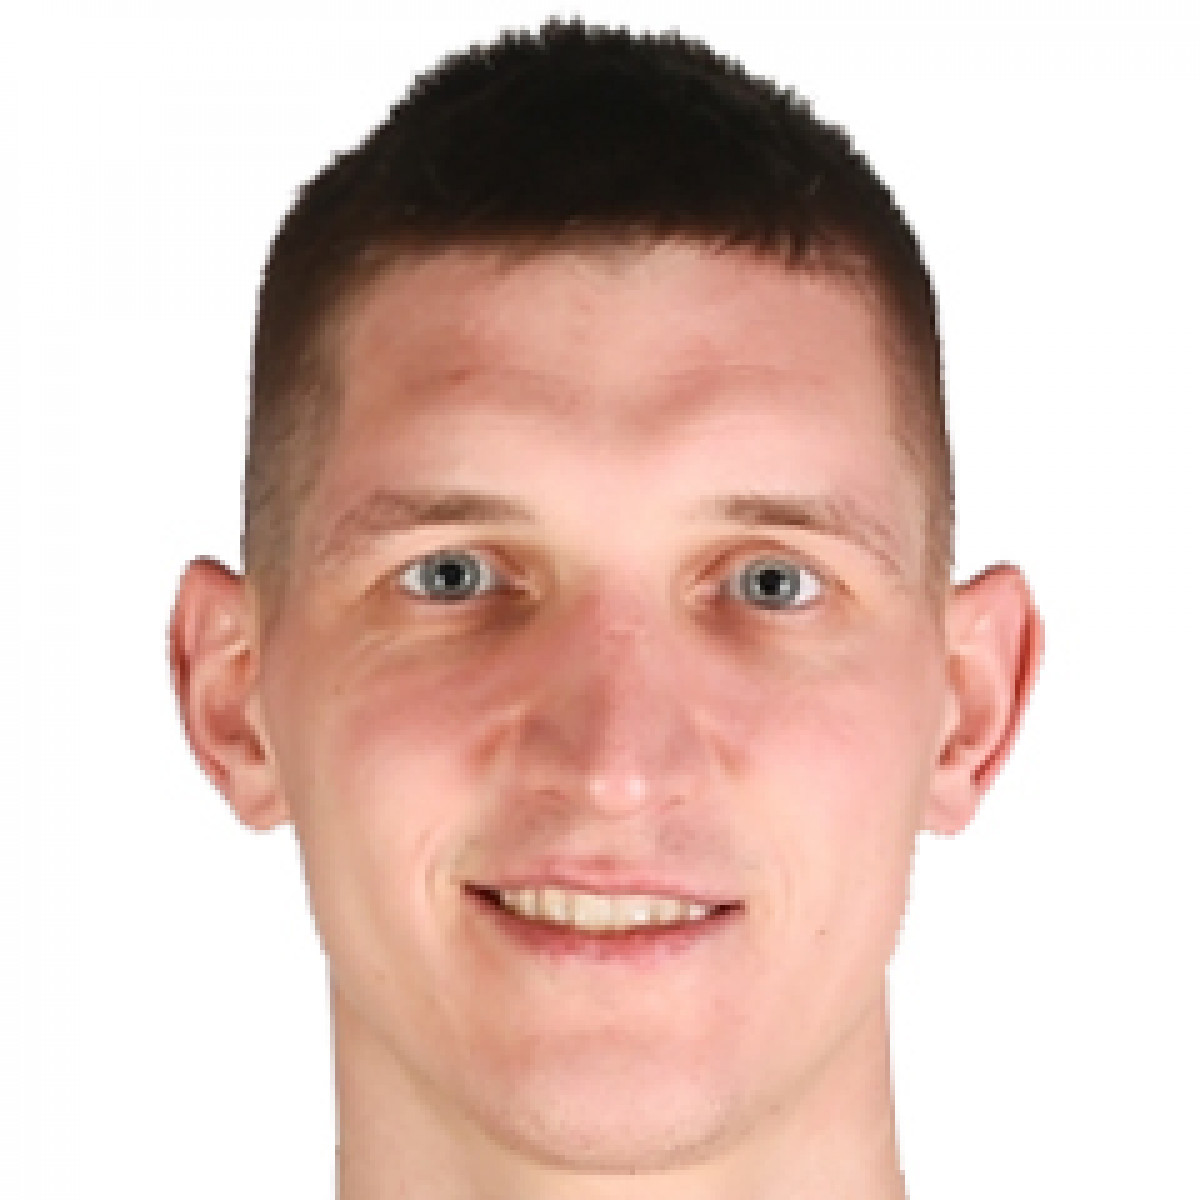 Dawid Slupinski